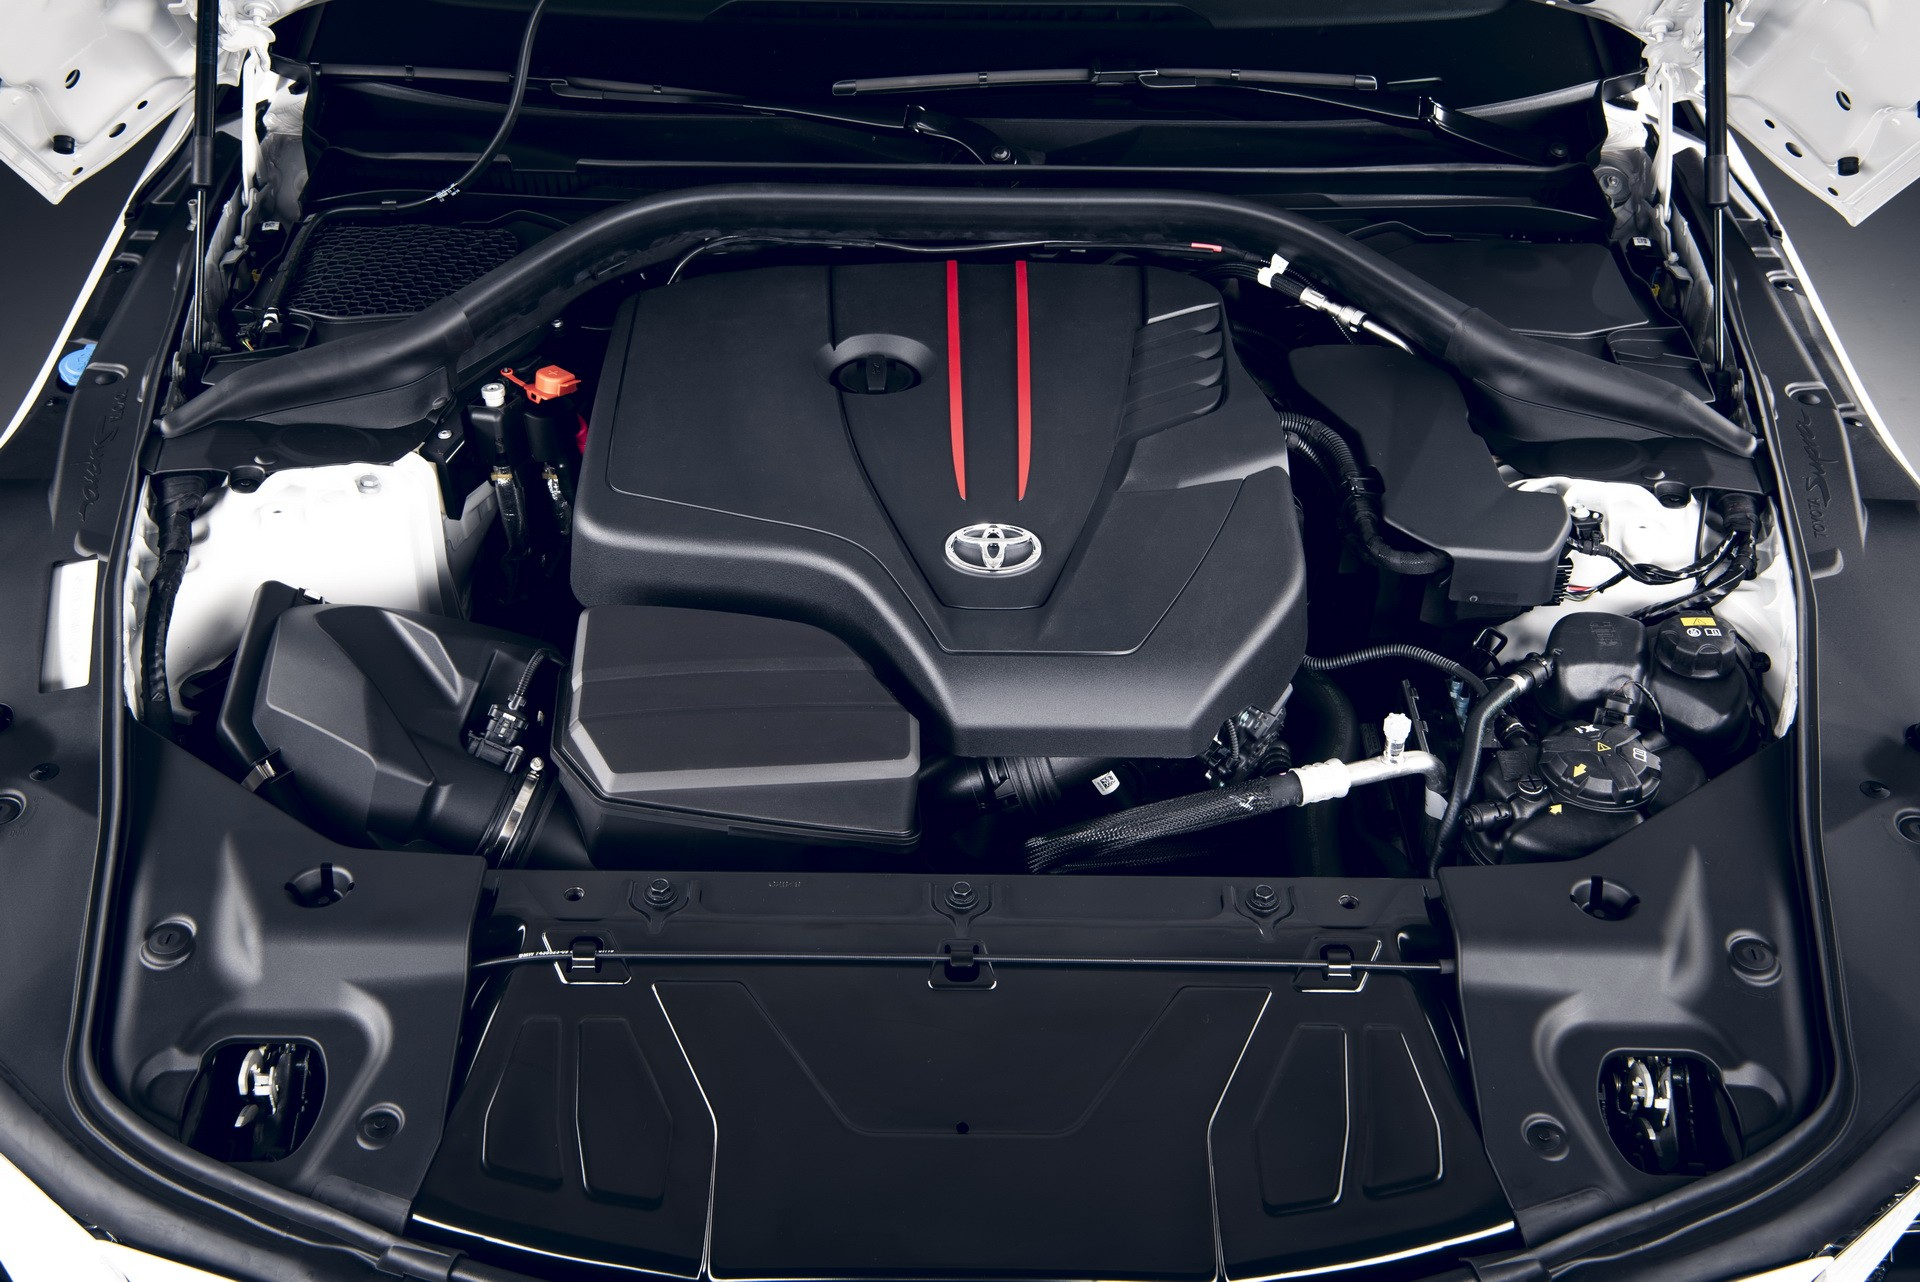 Toyota GR Supra (A90) 2020 37